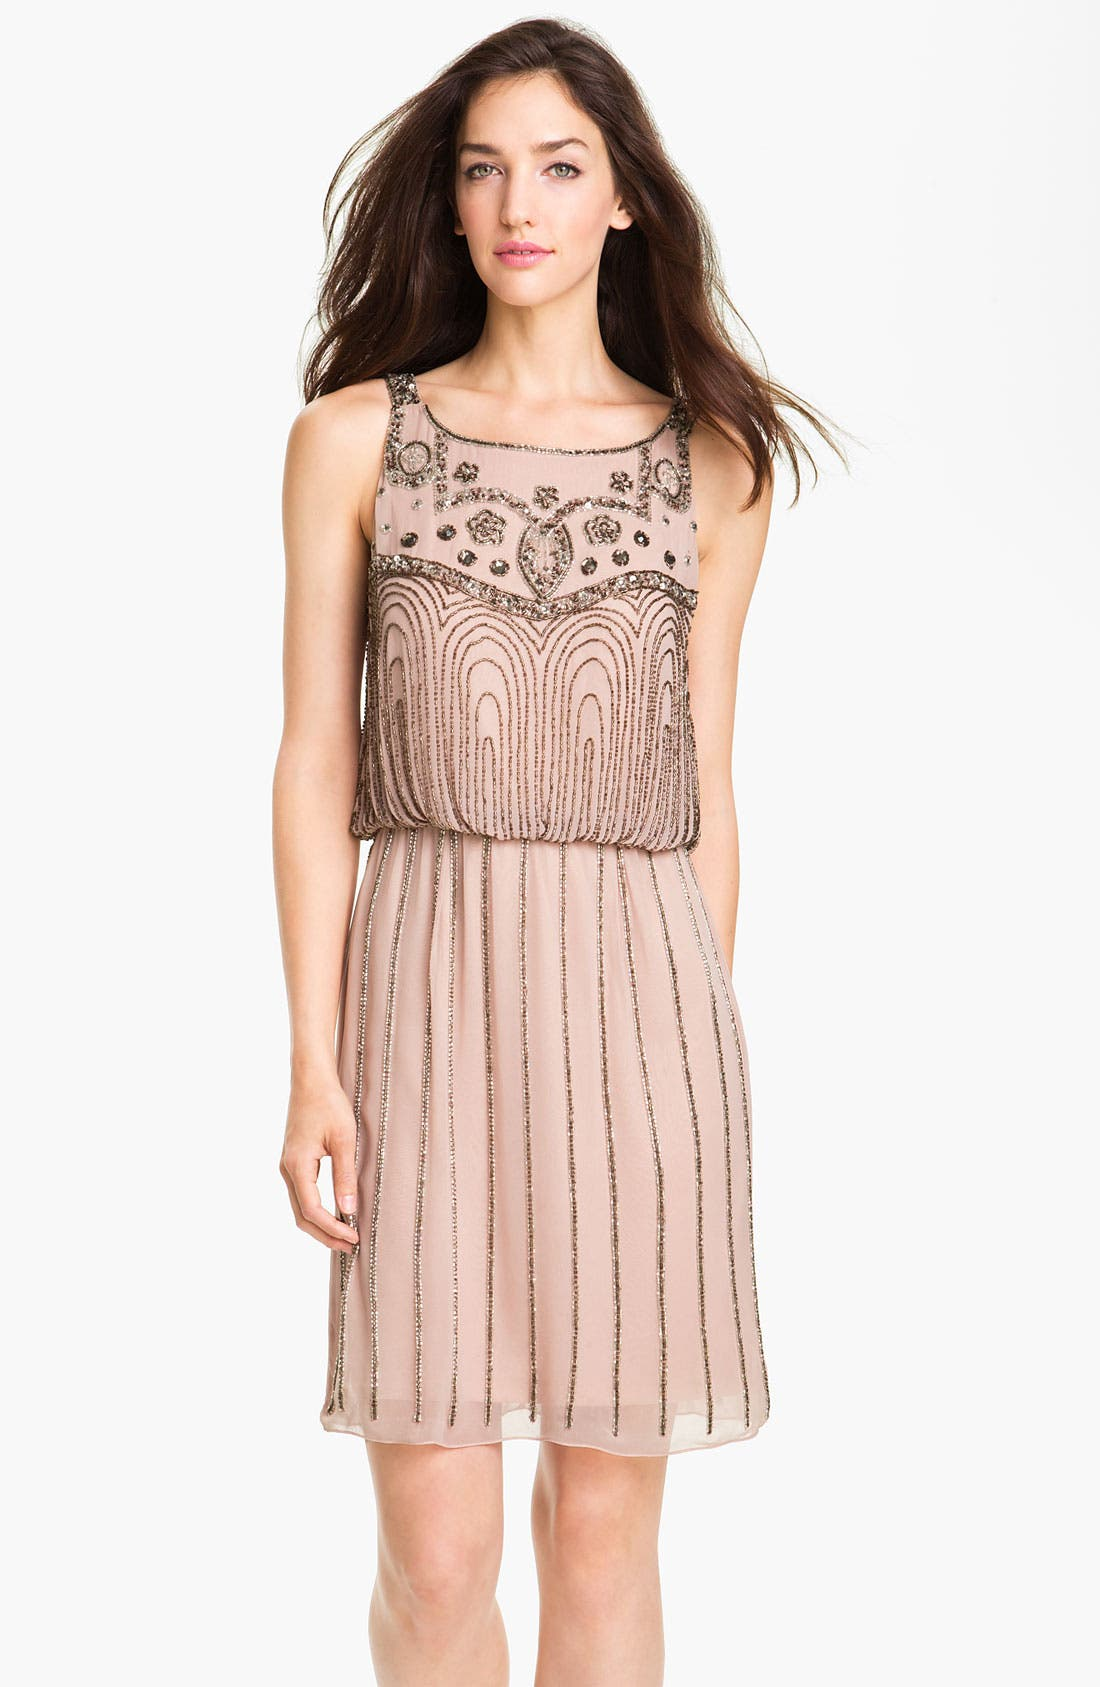 Alternate Image 1 Selected - JS Collections Beaded Chiffon Blouson Dress (Petite)